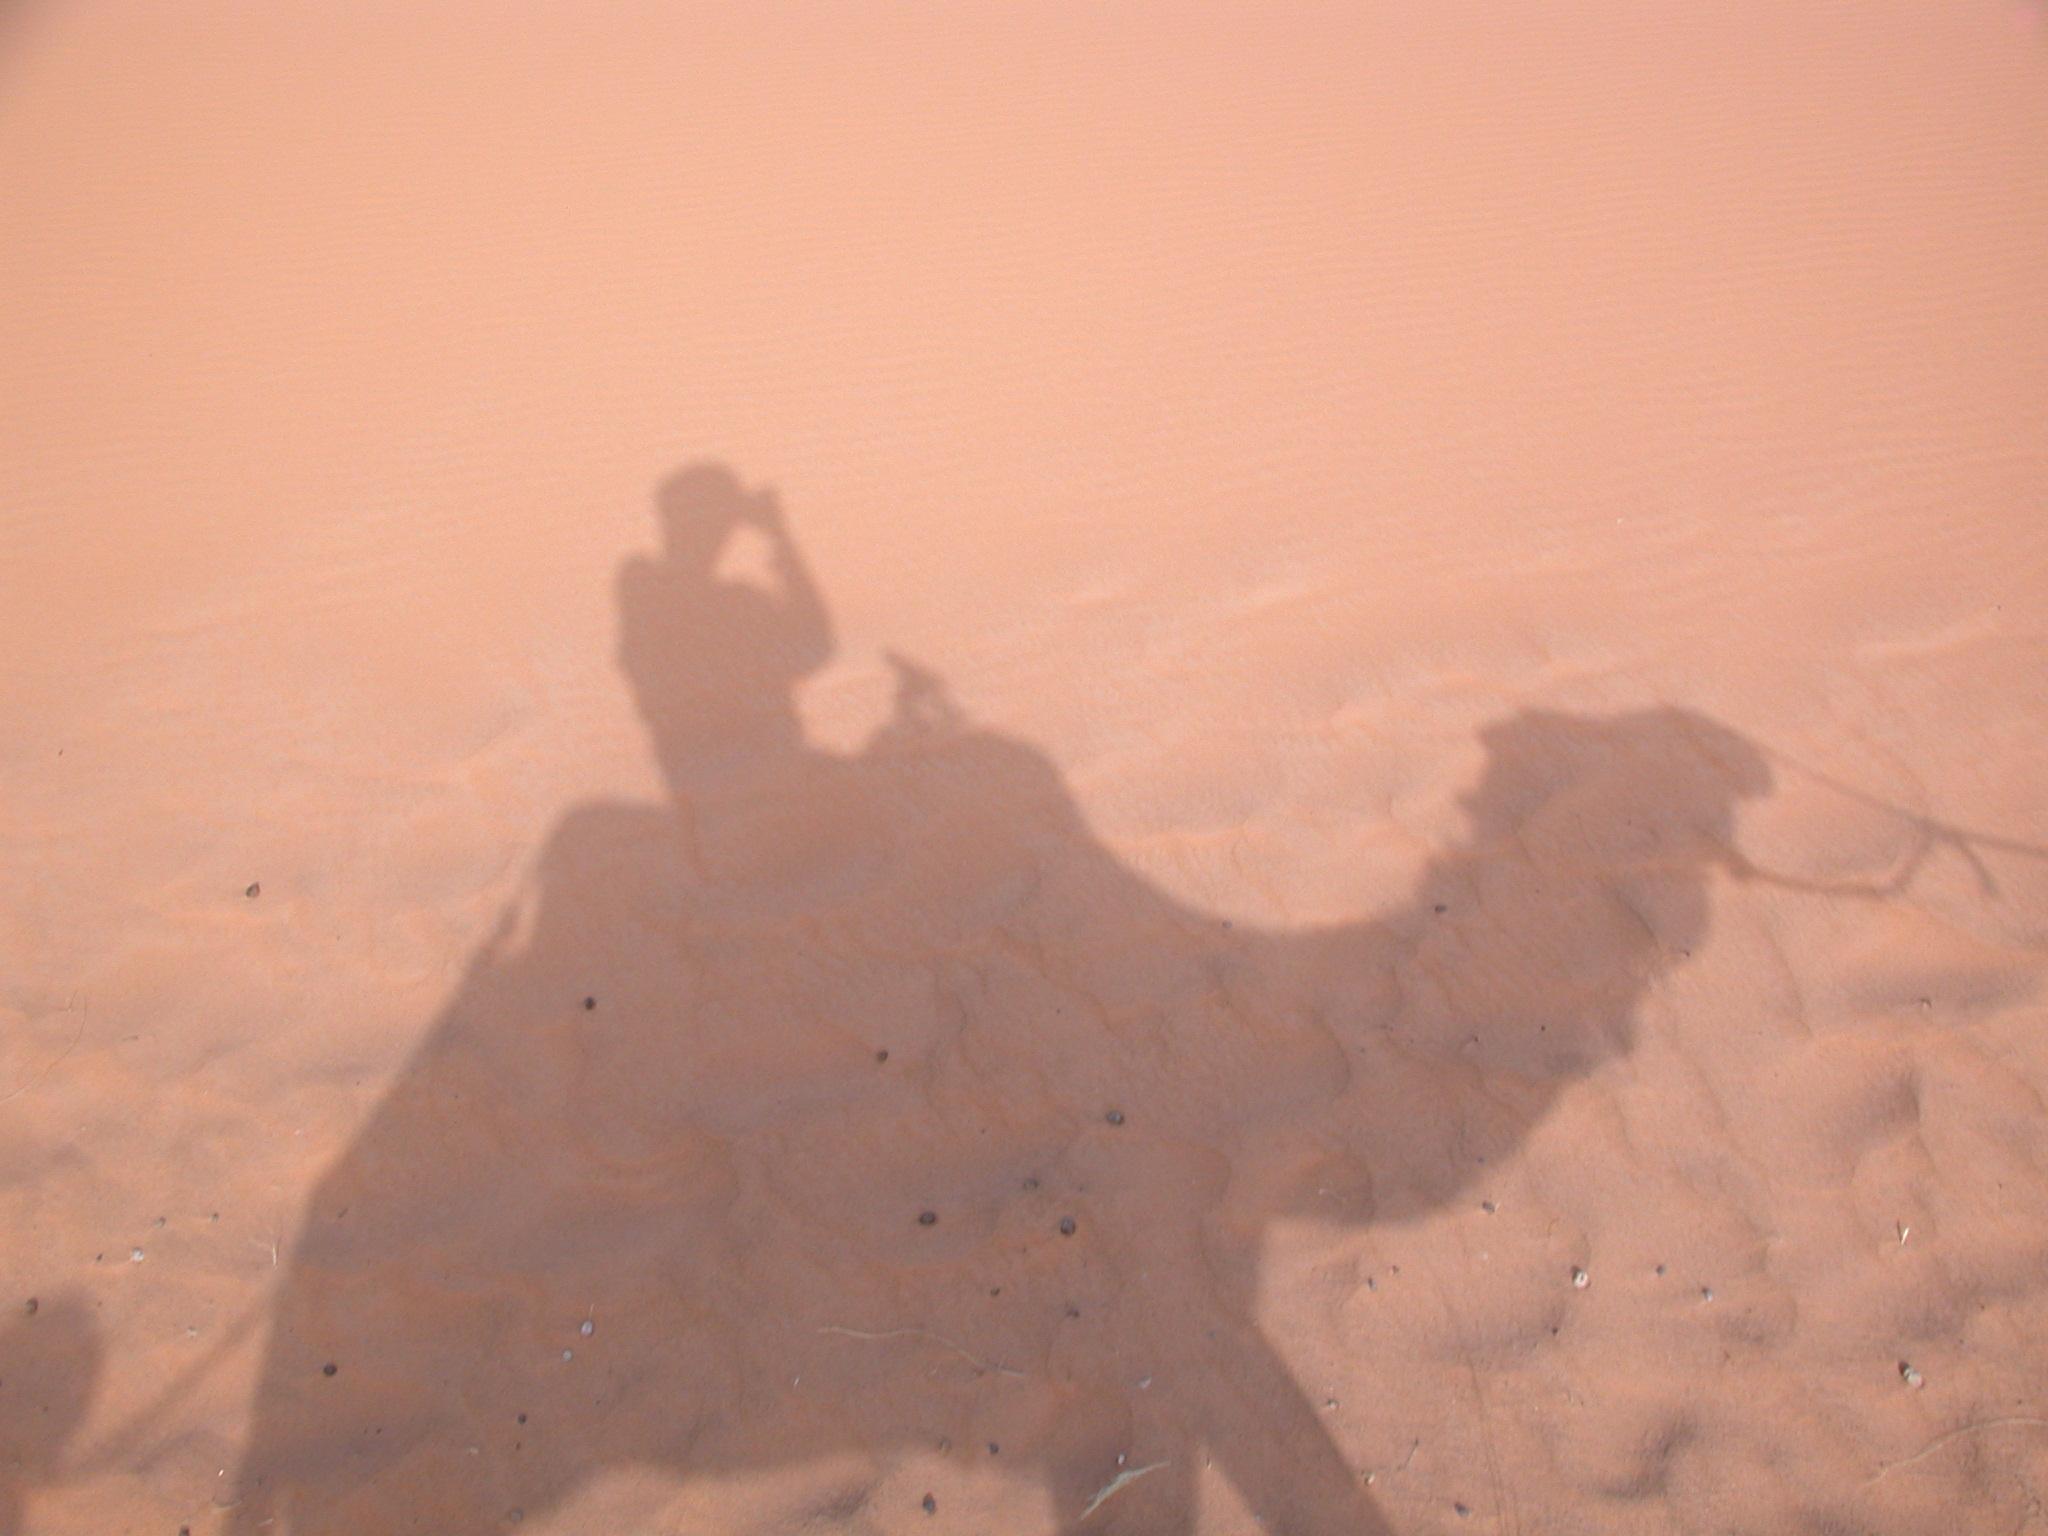 Luca Errera, Daniela Trastulli, Marocco, deserto